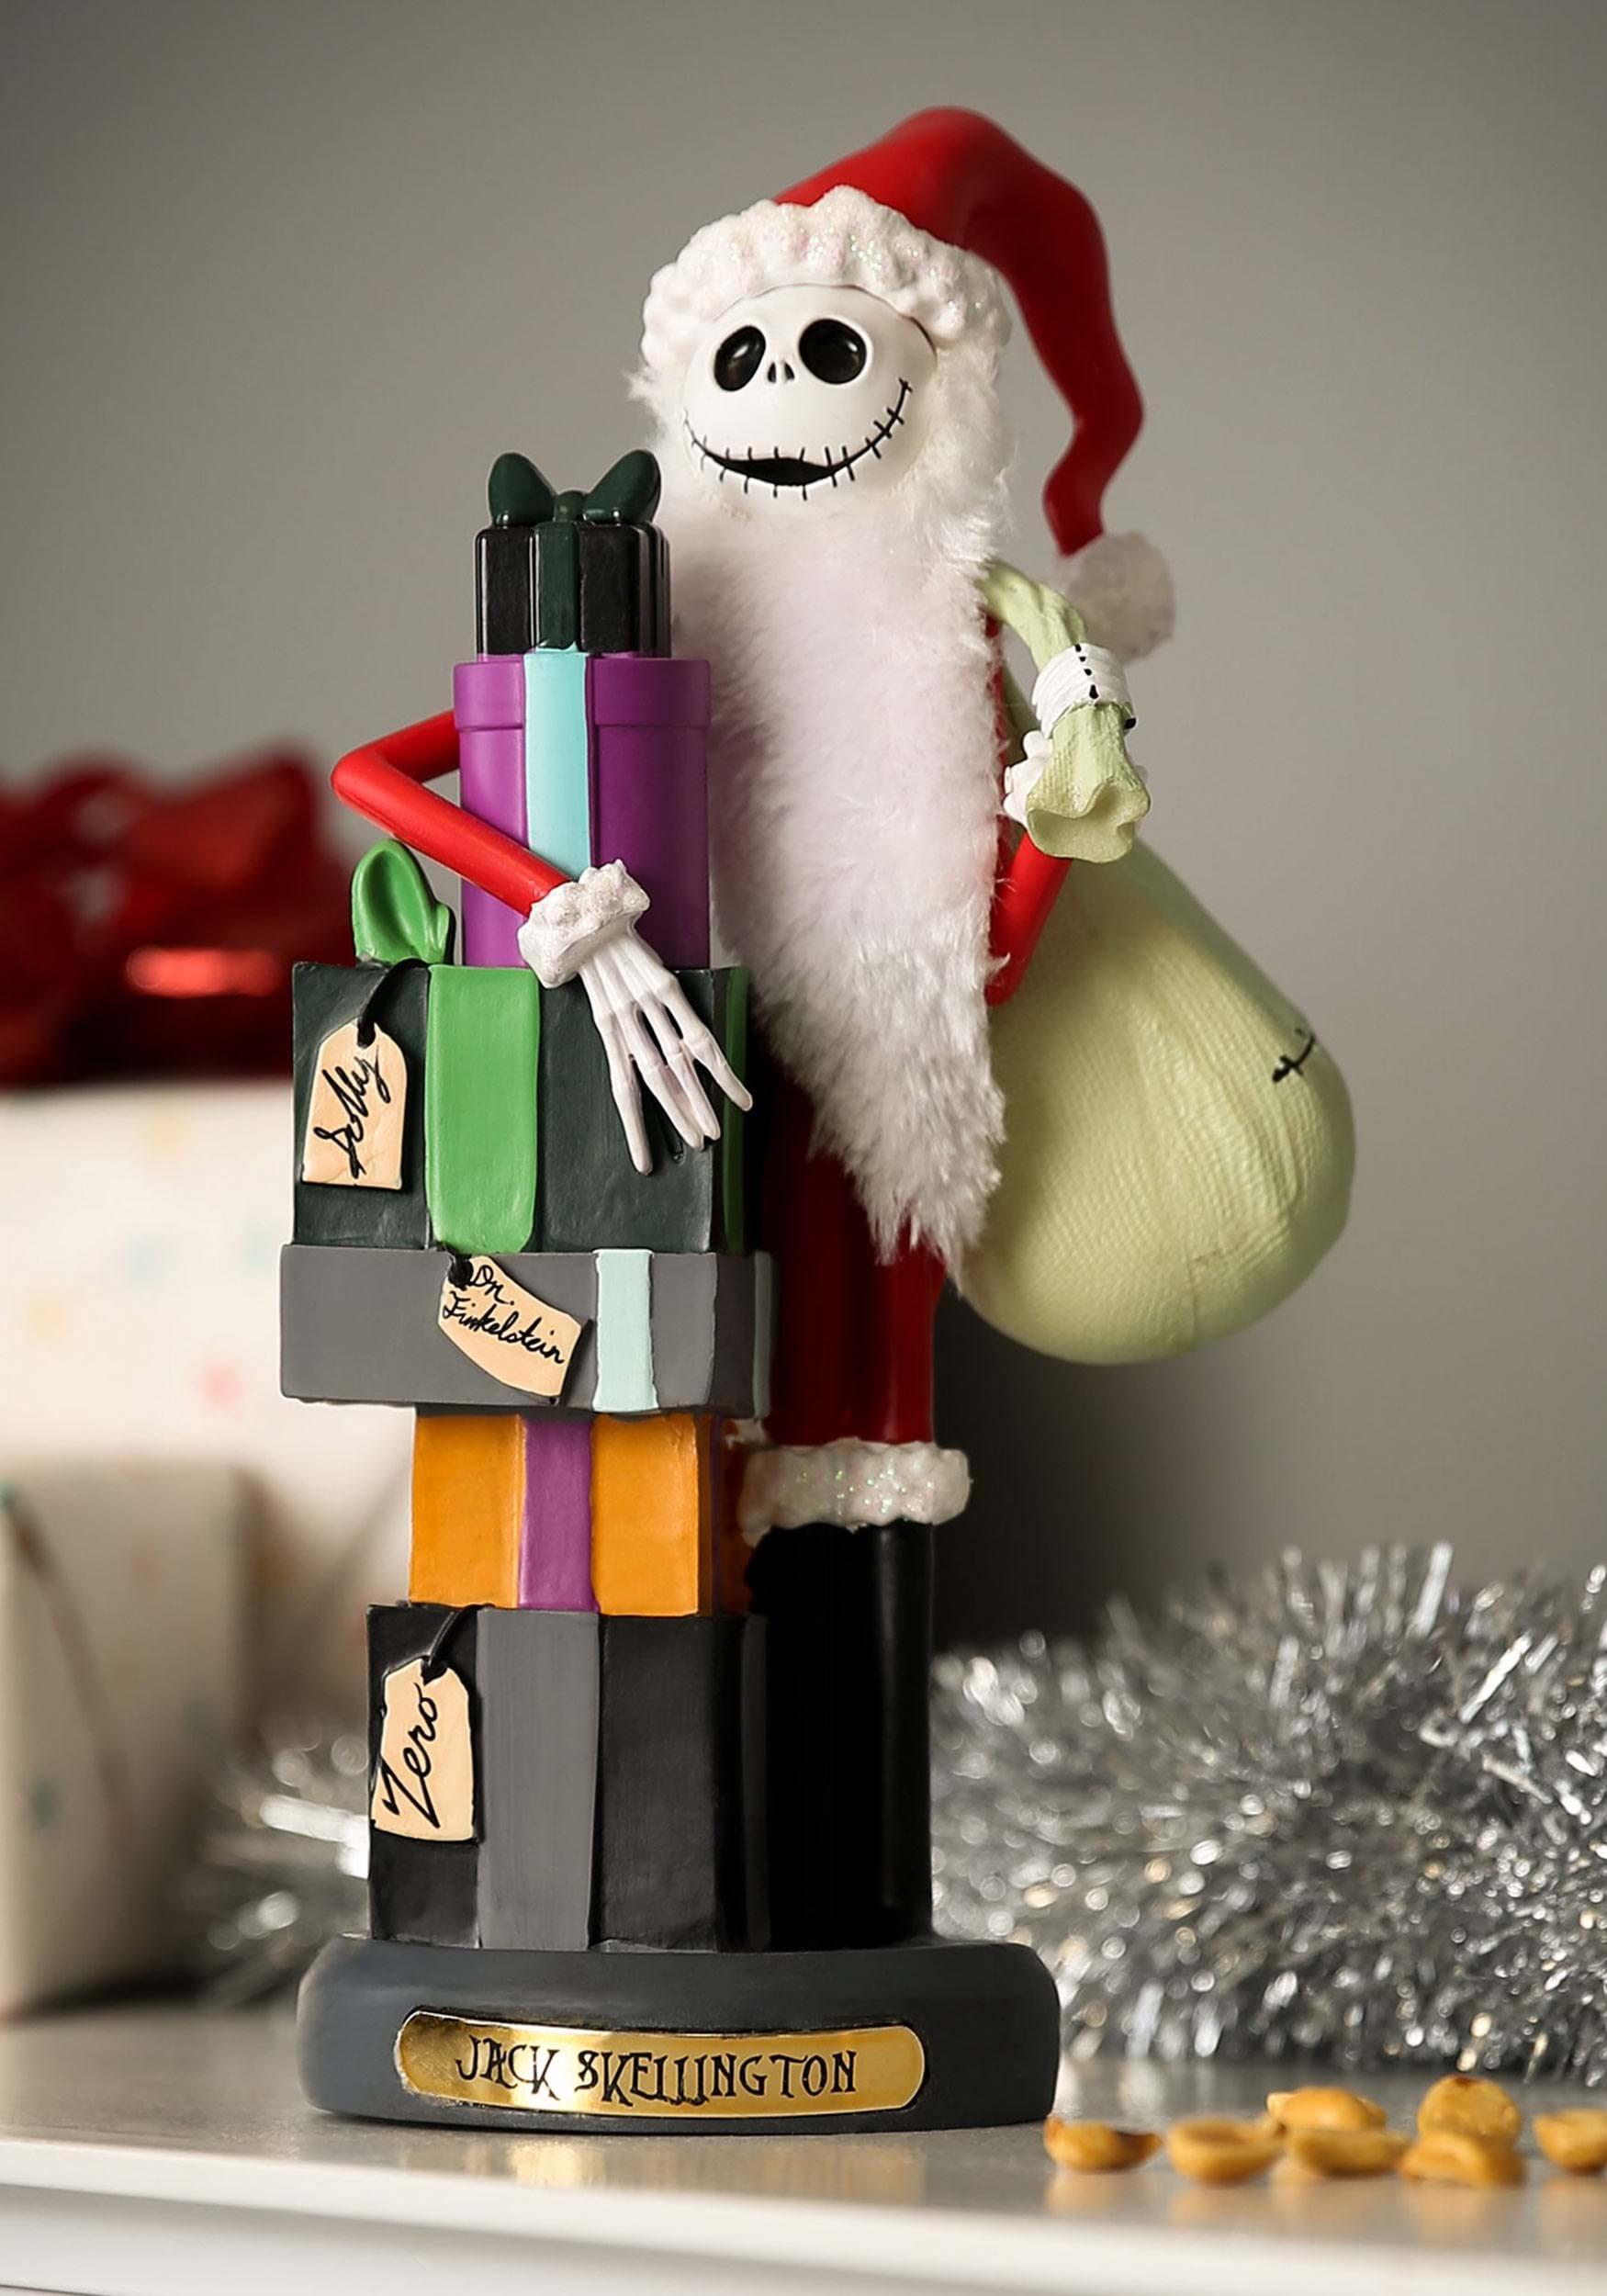 10 nightmare before christmas jack skellington nutcracker1 - Nightmare Before Christmas Nutcracker